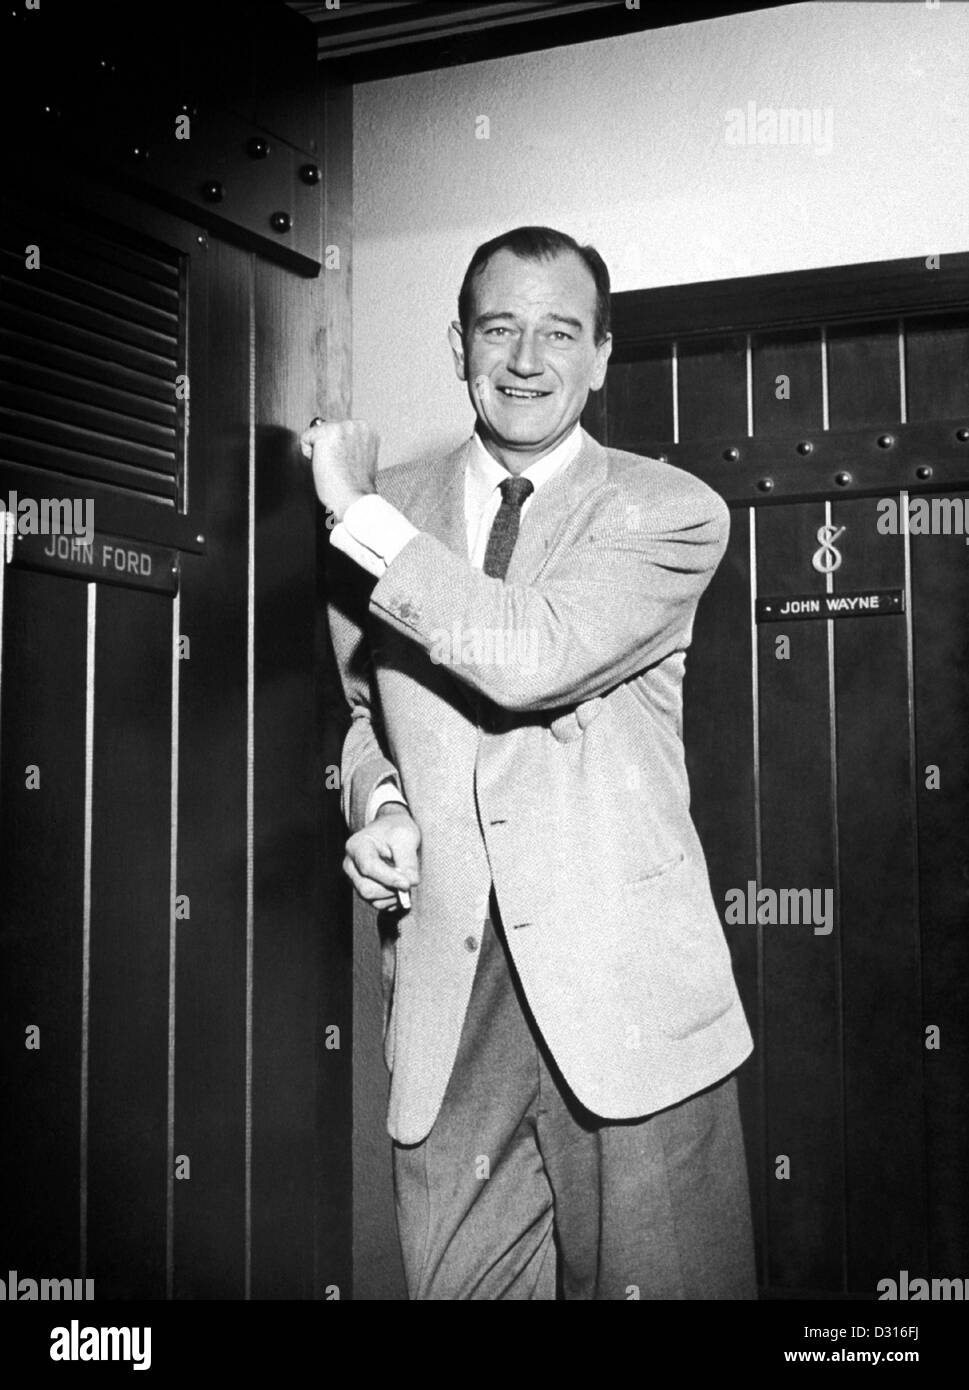 John Wayne - Stock Image